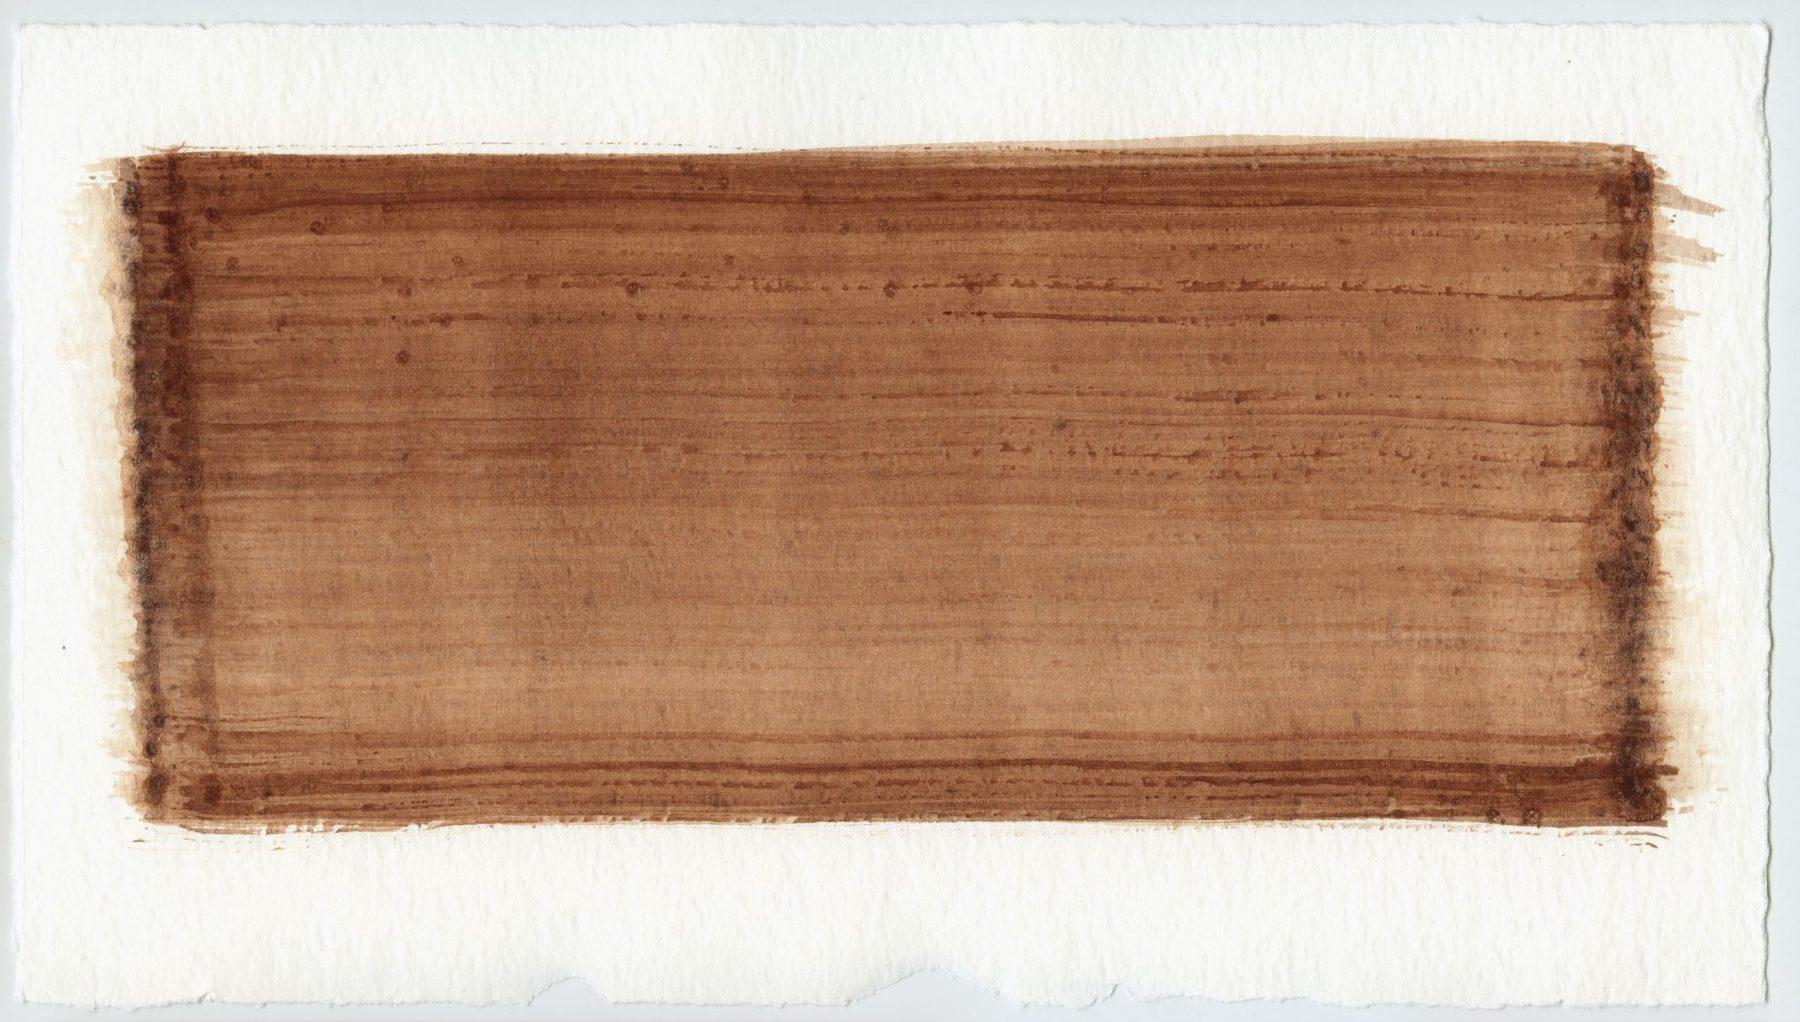 Brush stroke no. 7 - Selfmade pigment: IJzeroer gebrand